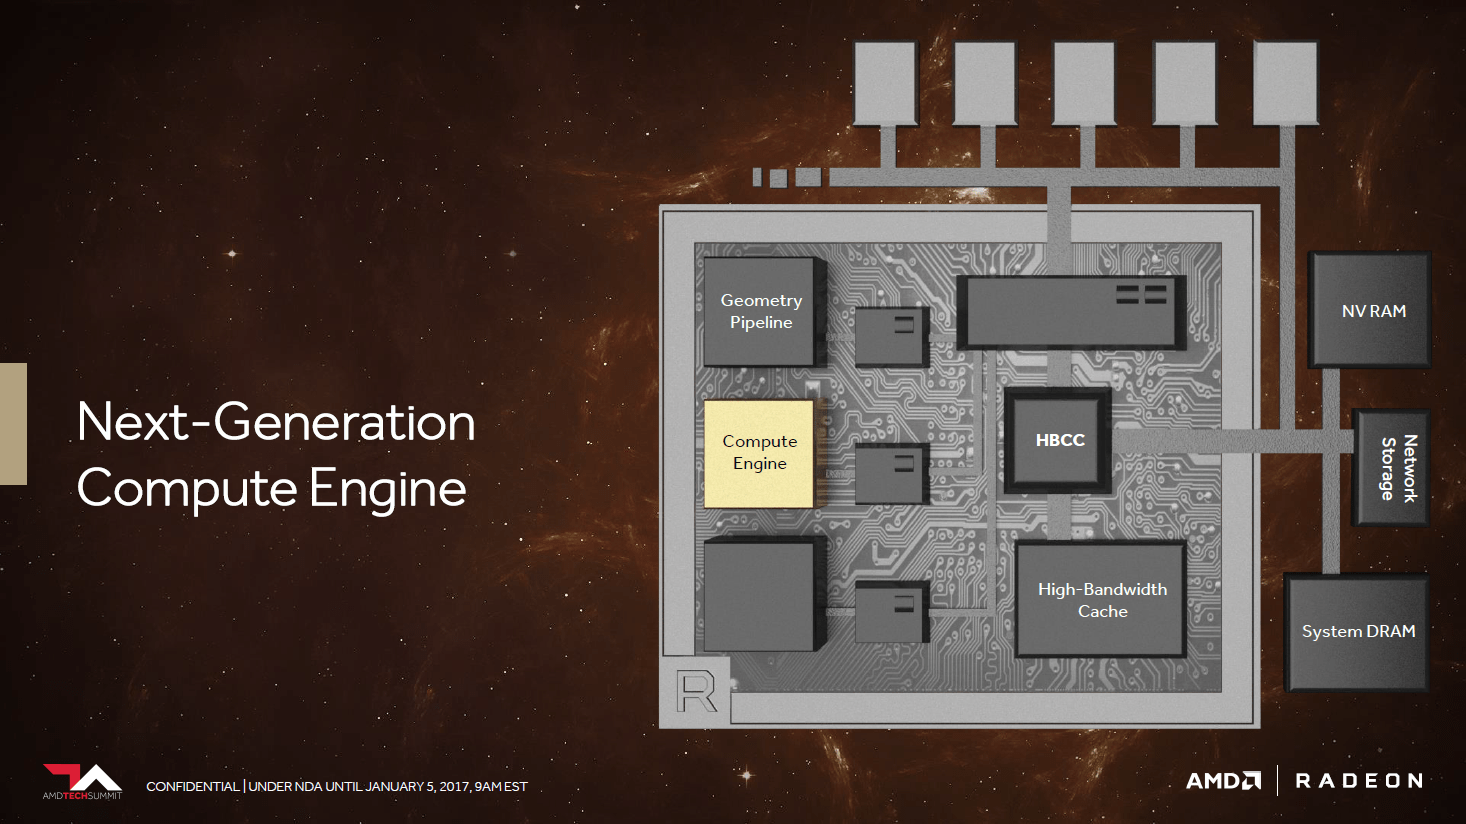 Vega mit neuer Compute Engine